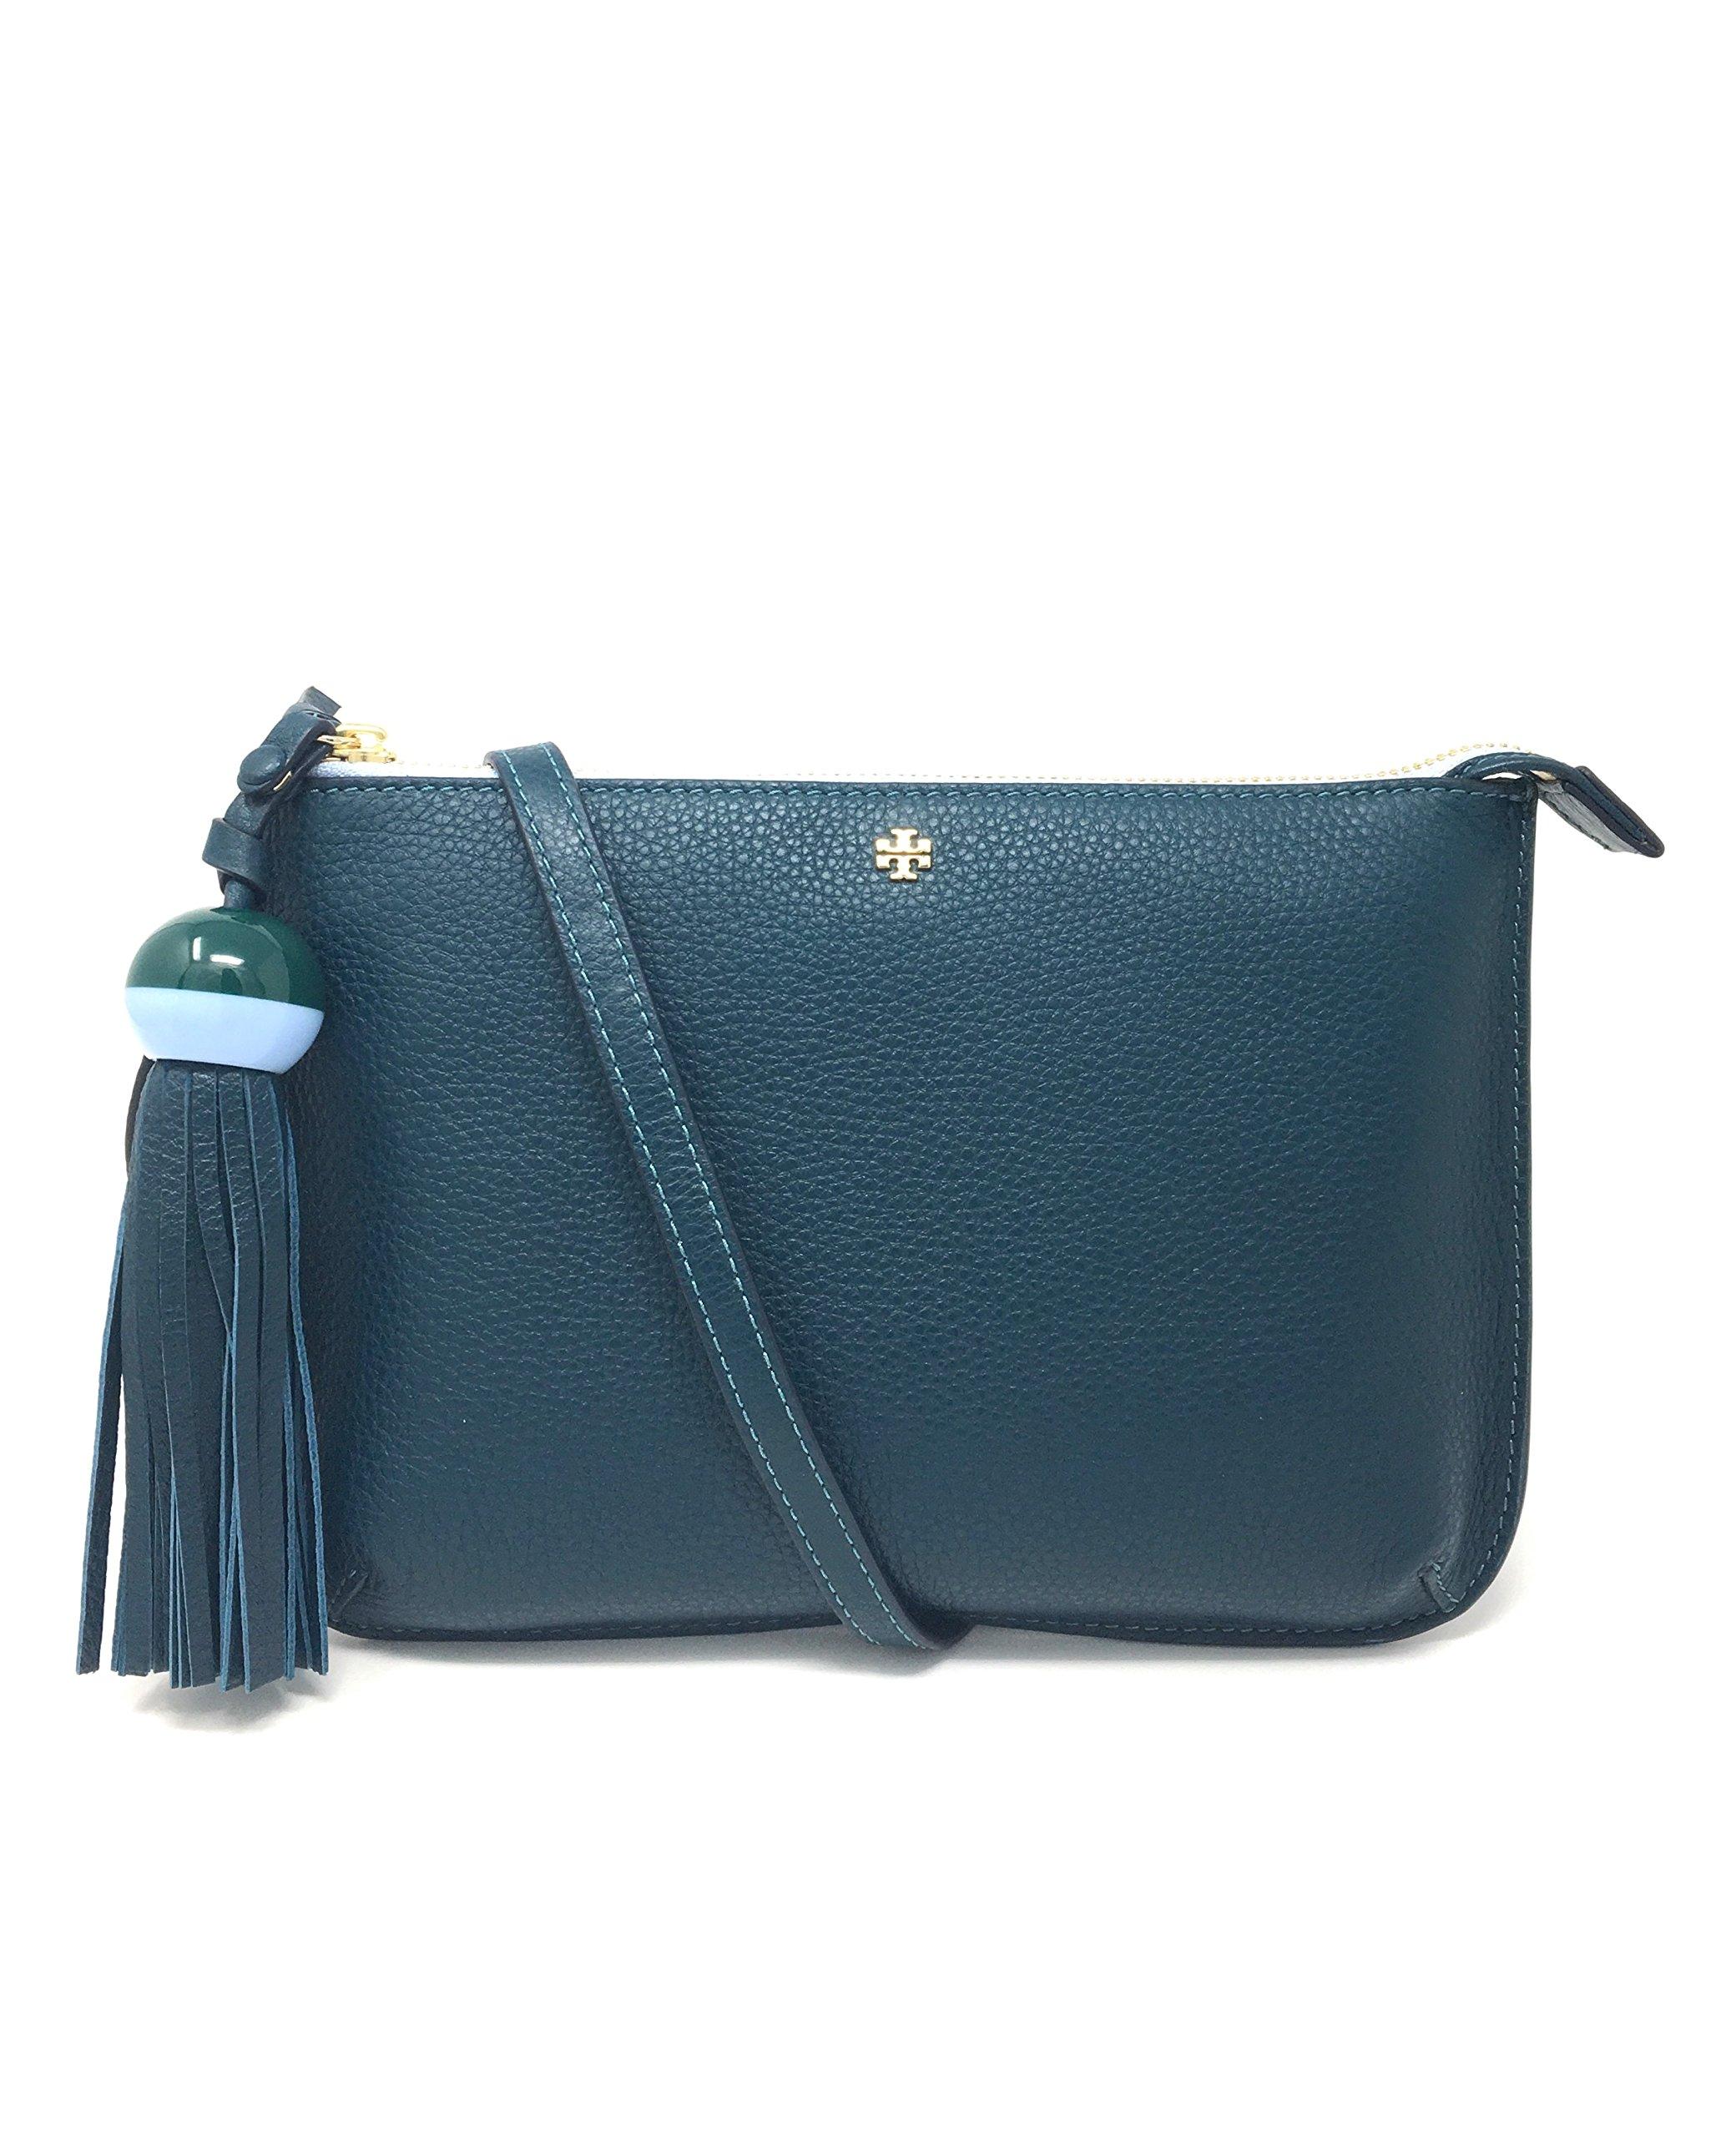 Tory Burch Tassel Cross Body bag style 435070817